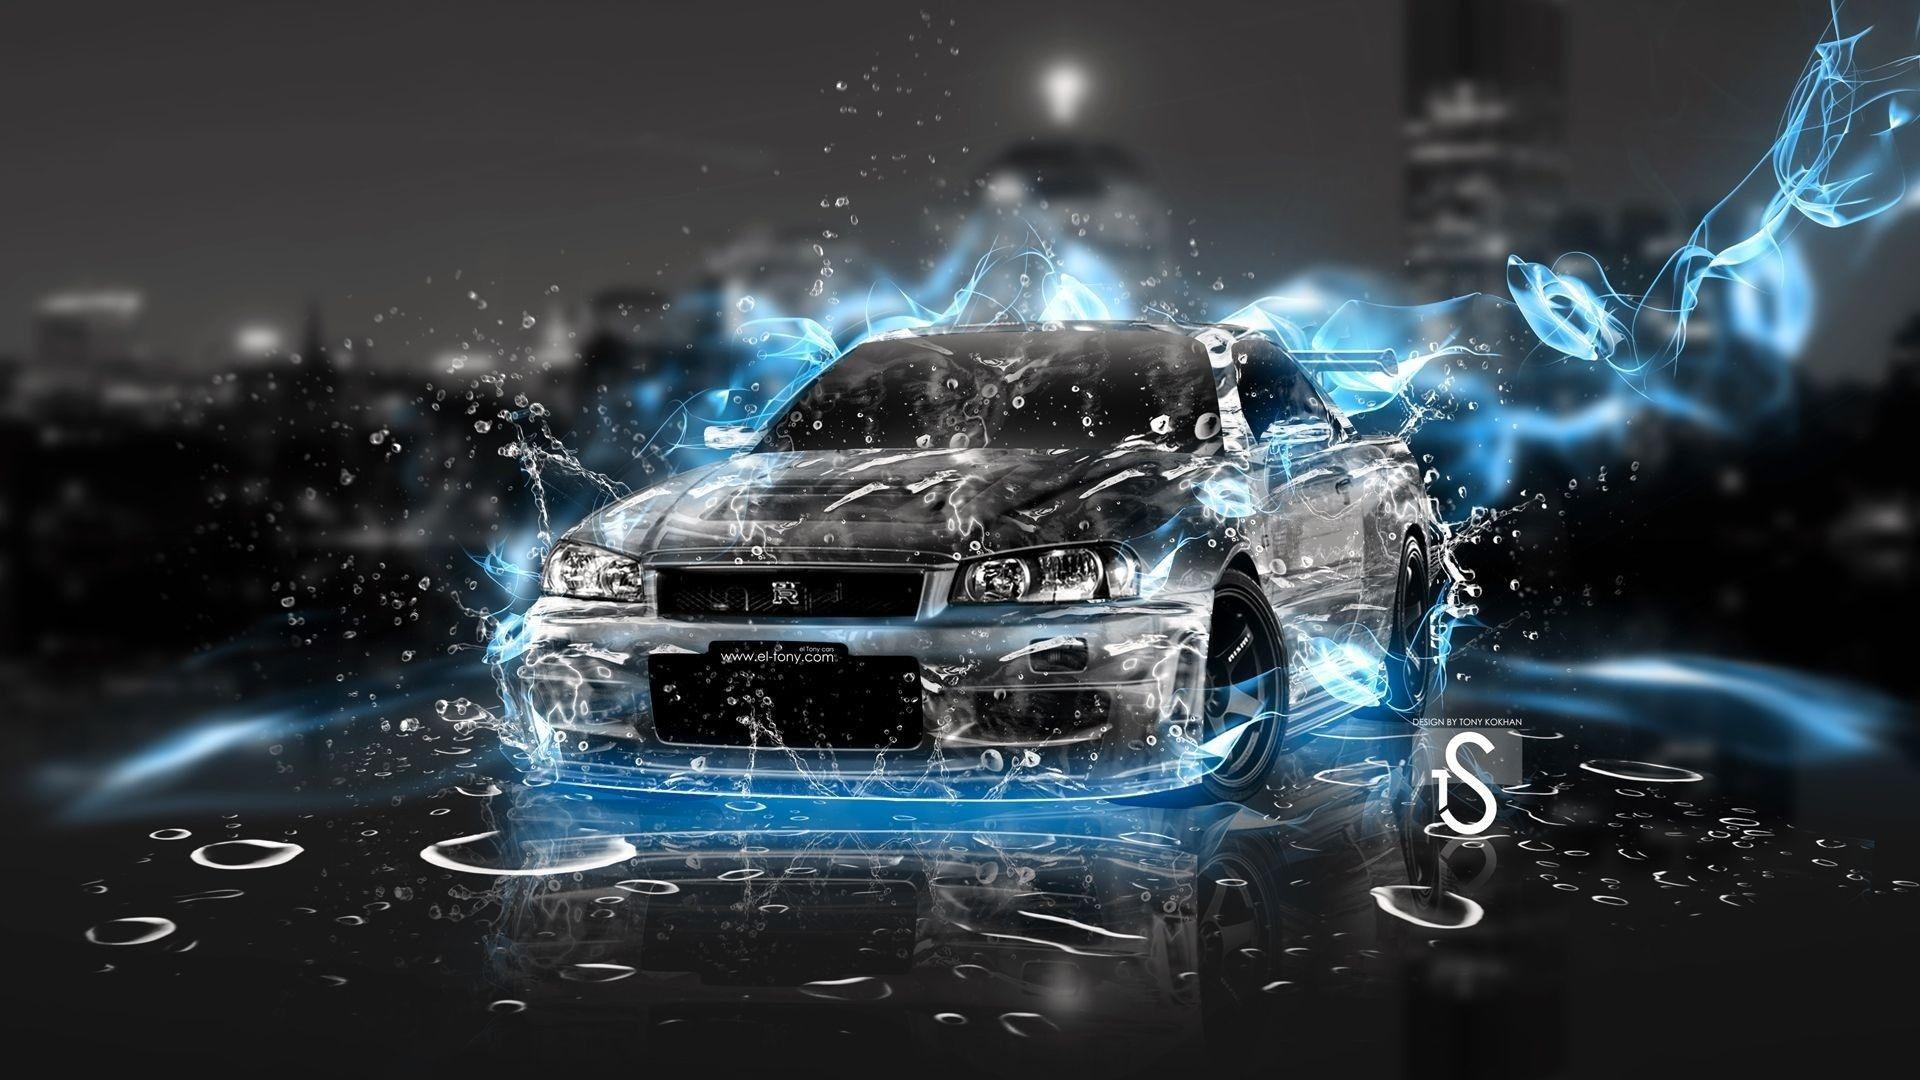 Pictures On The Desktop Cars, Nissan Skyline Wallpaper